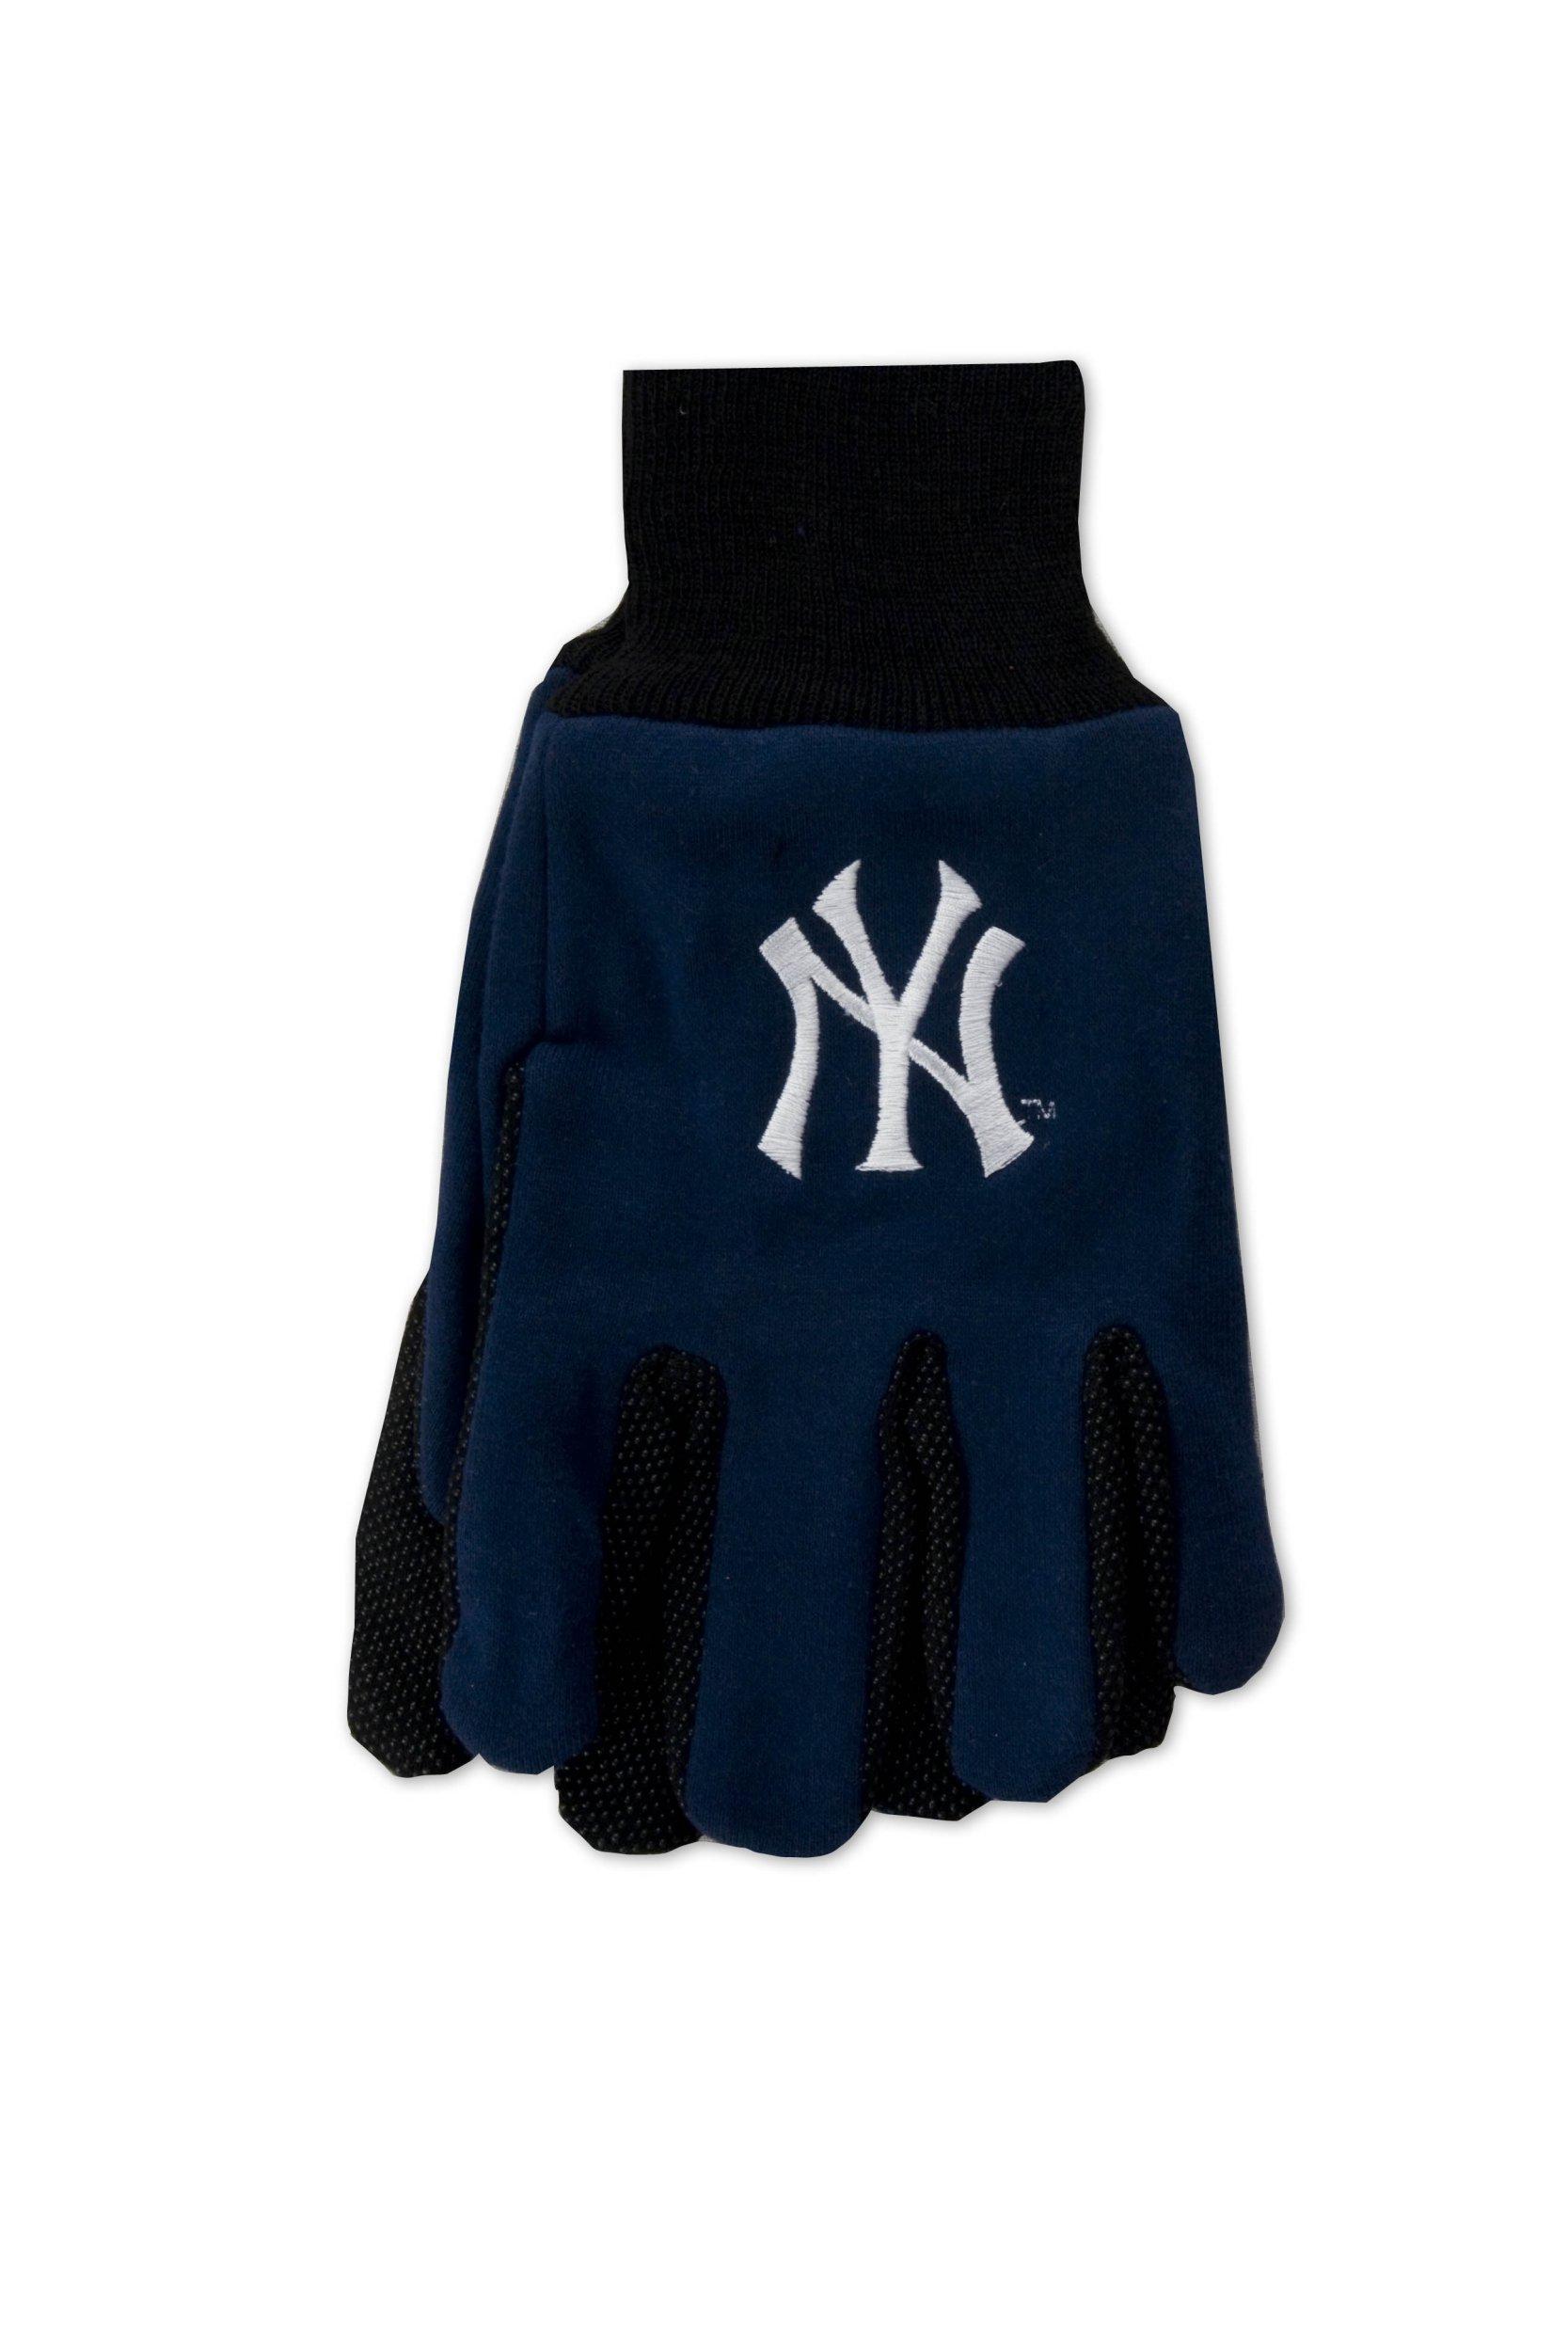 Yankee Baseball Gifts: Amazon.com